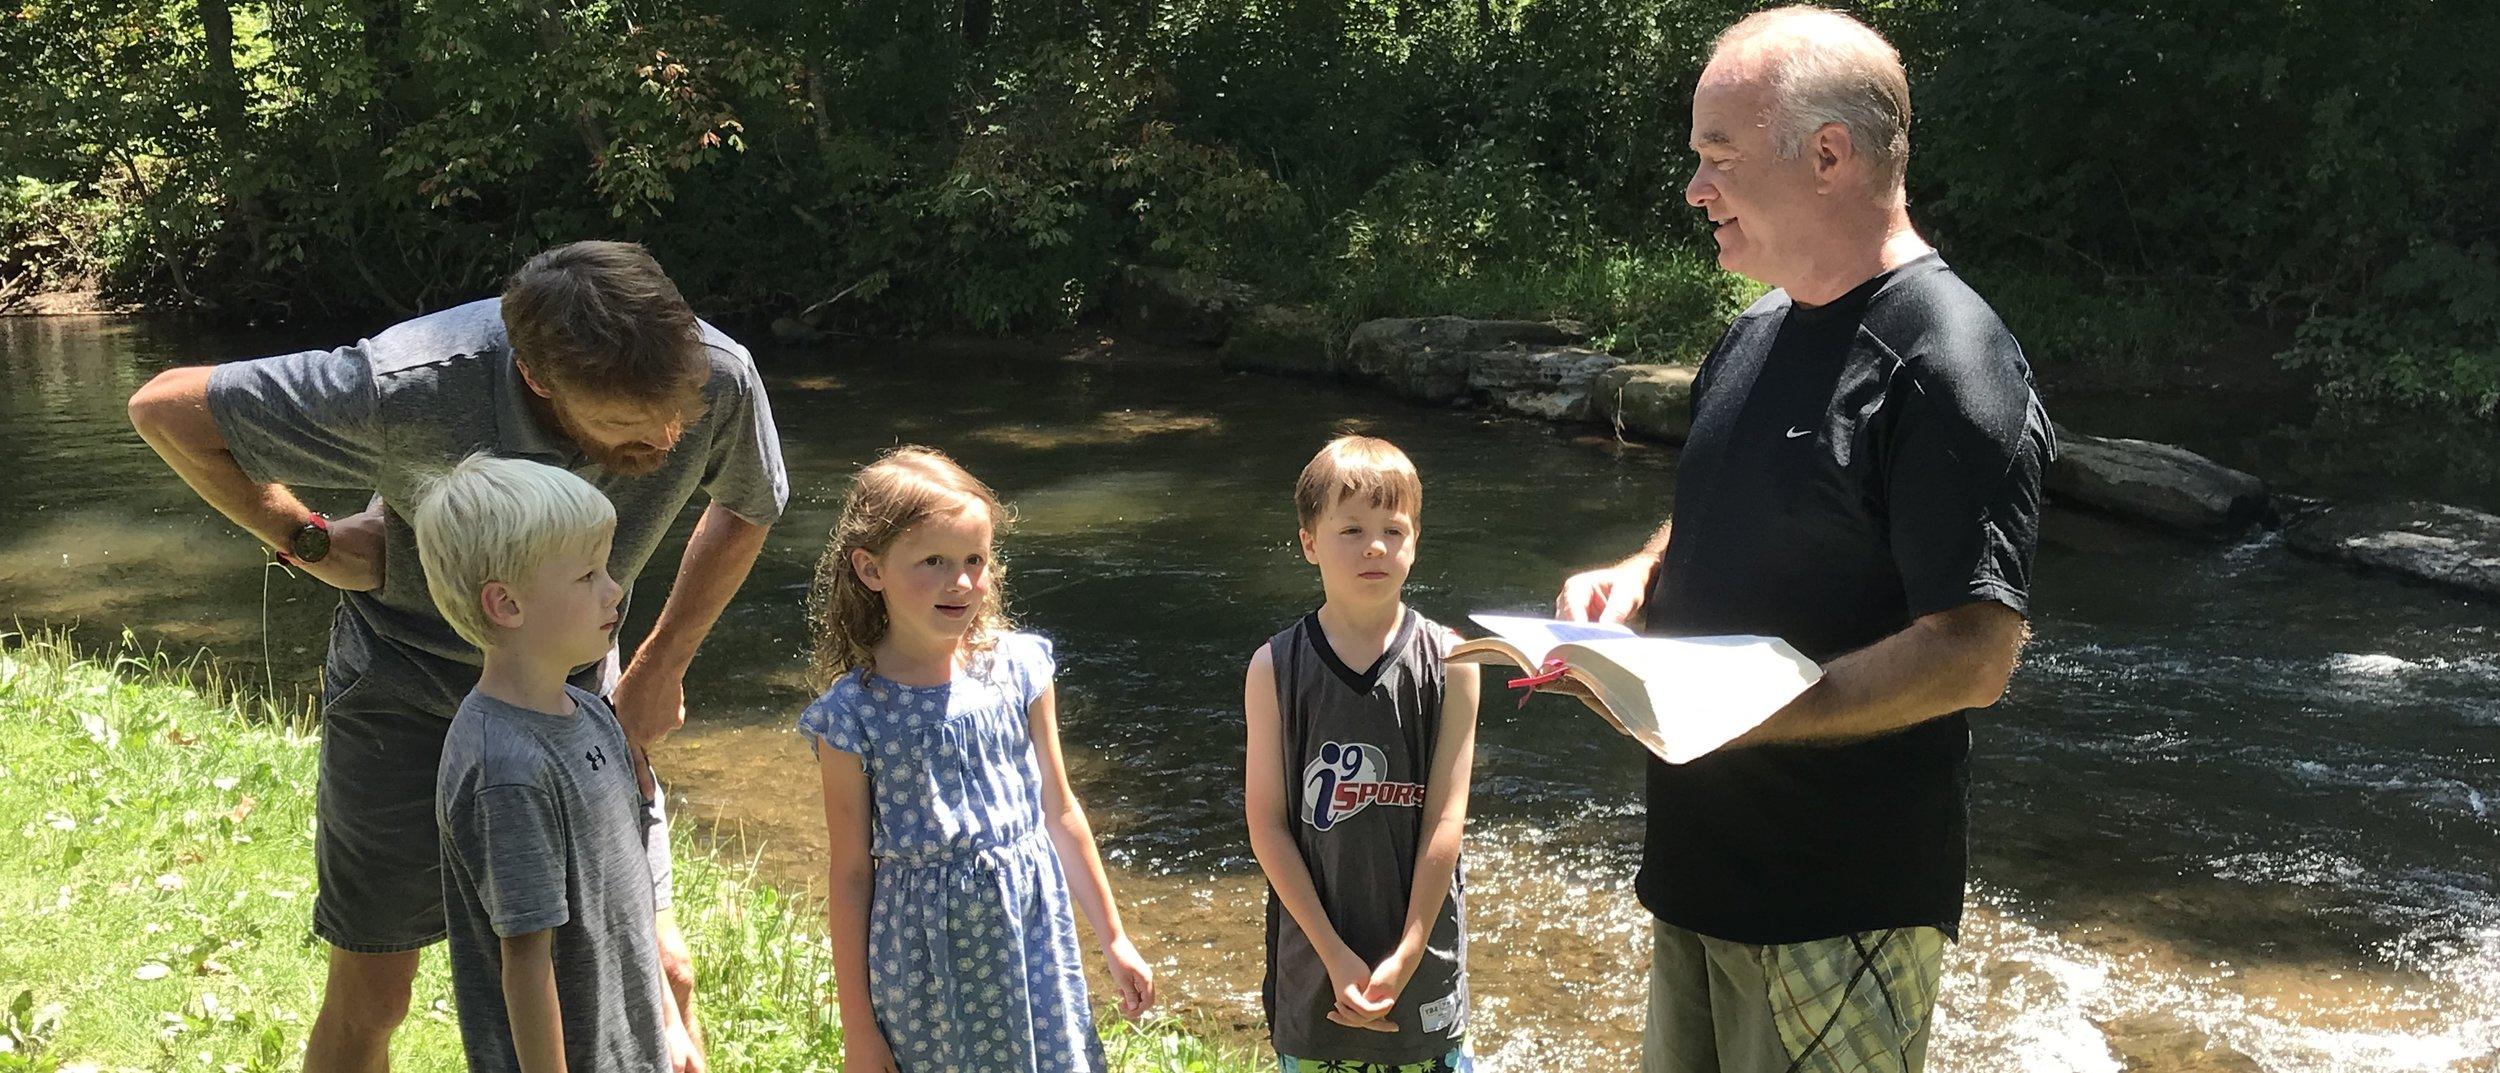 baptism 2019.jpeg